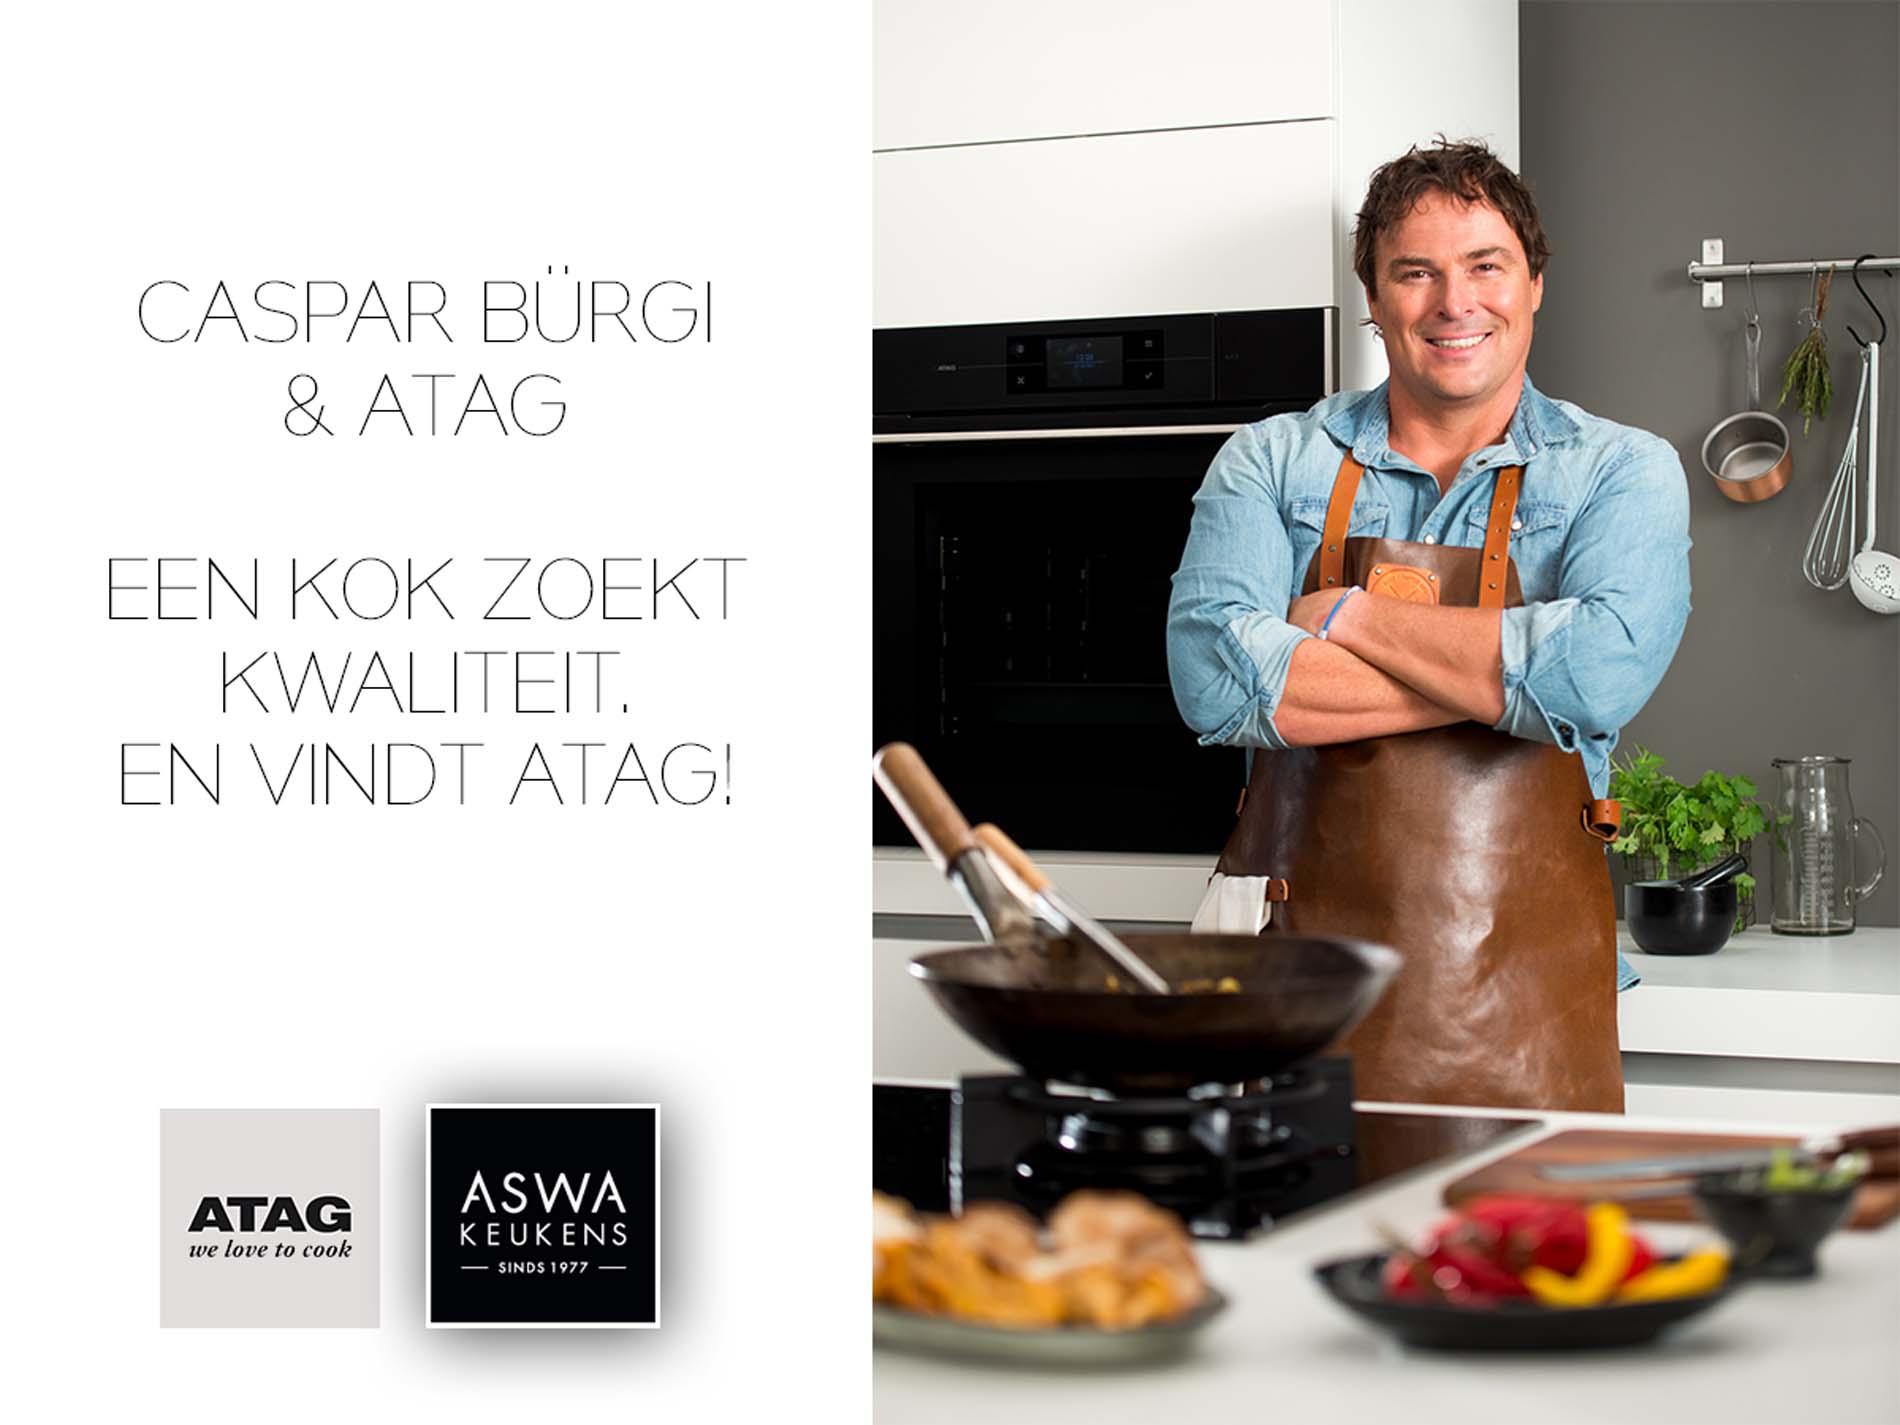 Samenwerking ATAG en Caspar Bürgi